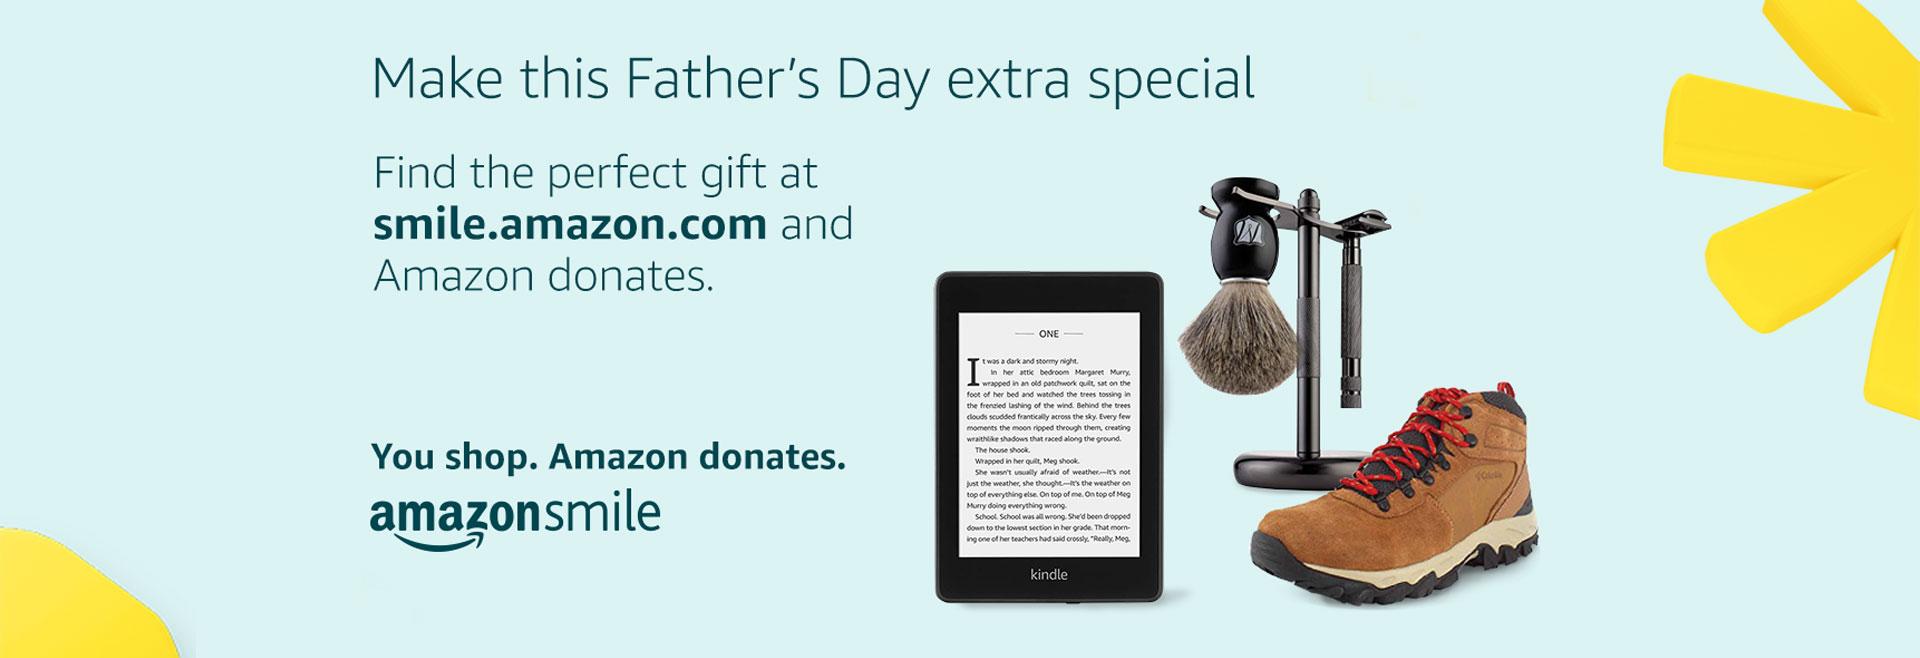 FathersDay-Amazon